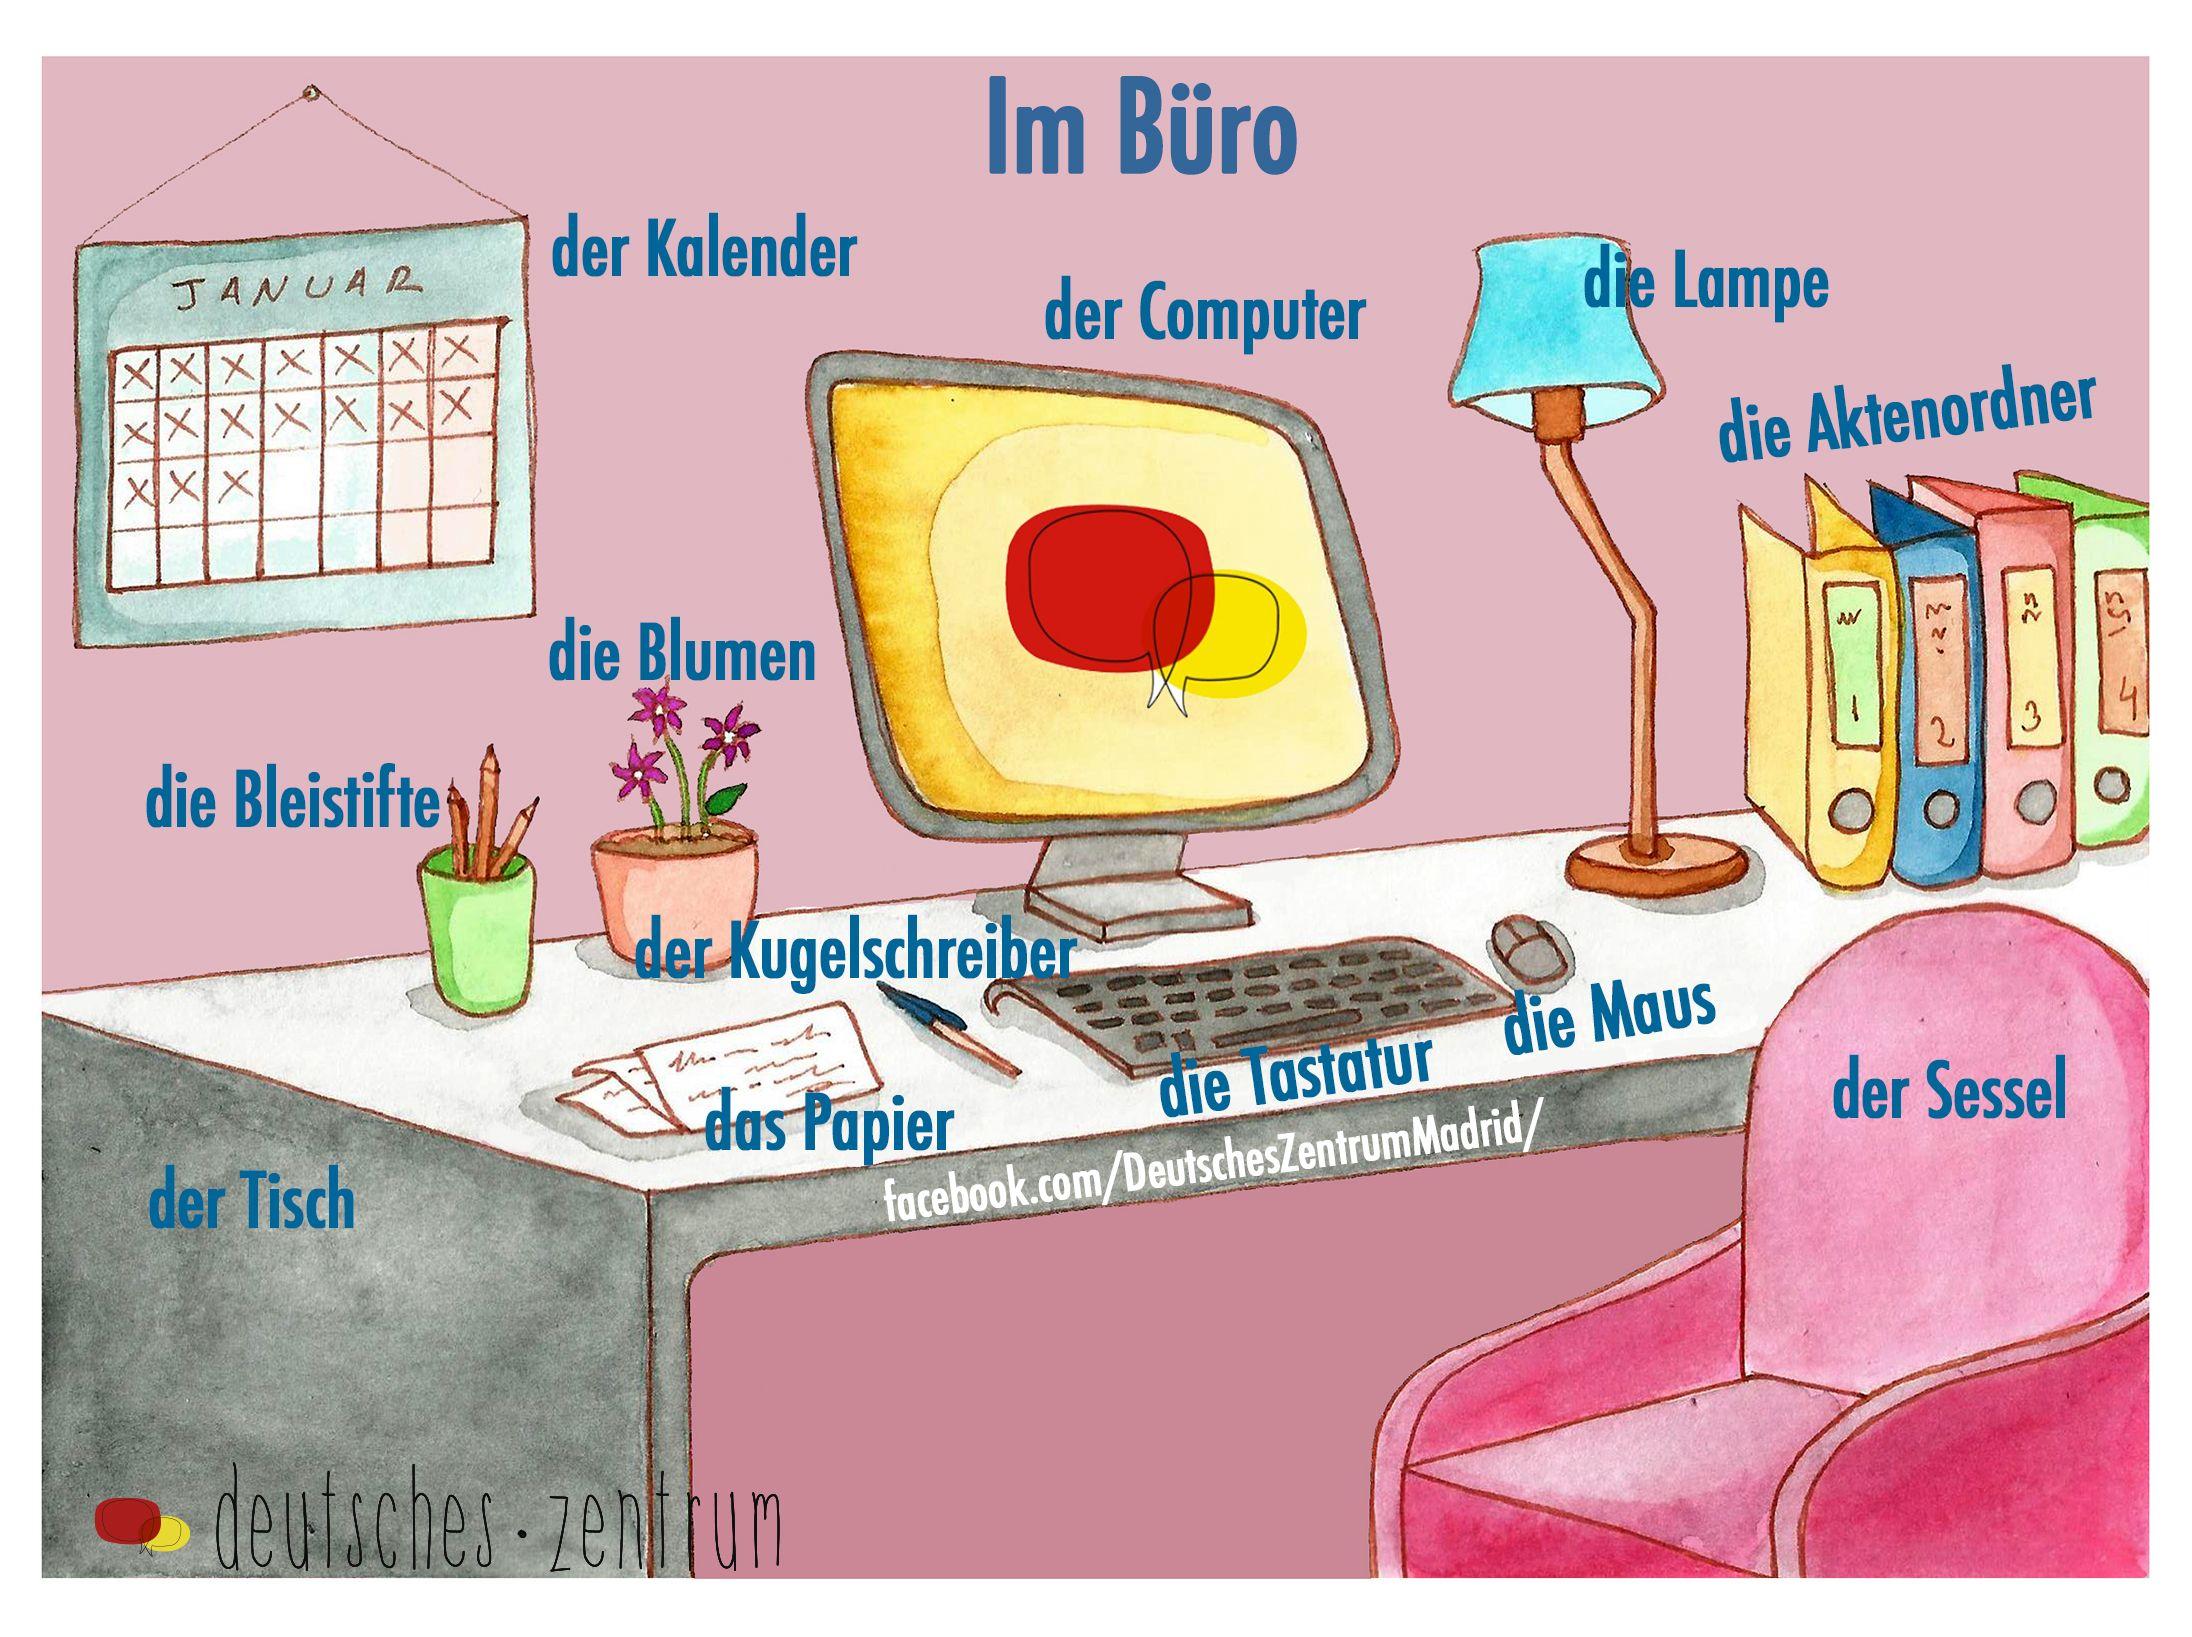 im b ro deutsch wortschatz vocabulario daf german alem n n met pinterest idioma alem n. Black Bedroom Furniture Sets. Home Design Ideas